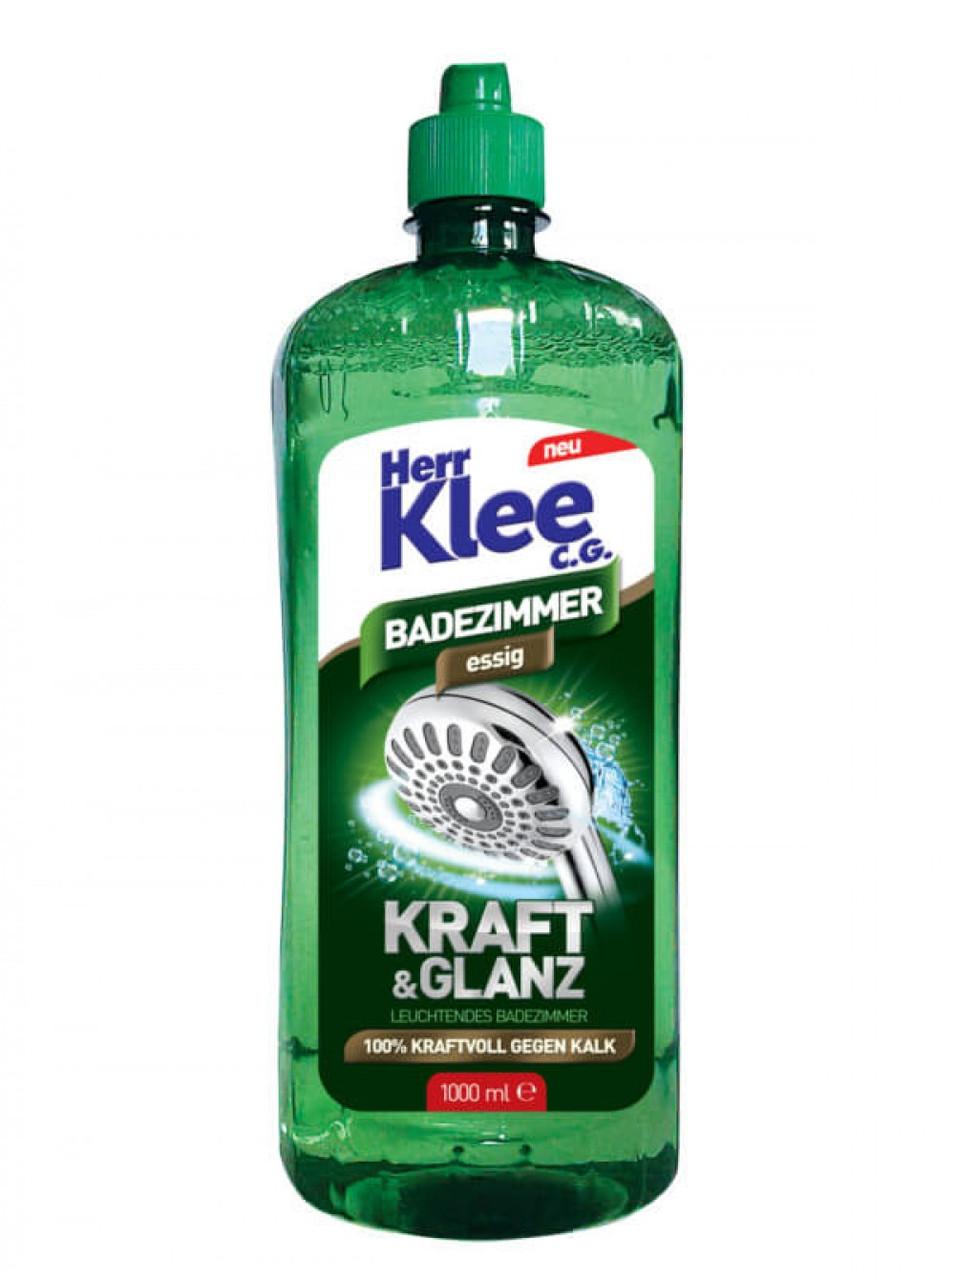 Універсальна рідина для прибирання ванних кімнат Herr Klee Badezimmer Essig 1000 ml.